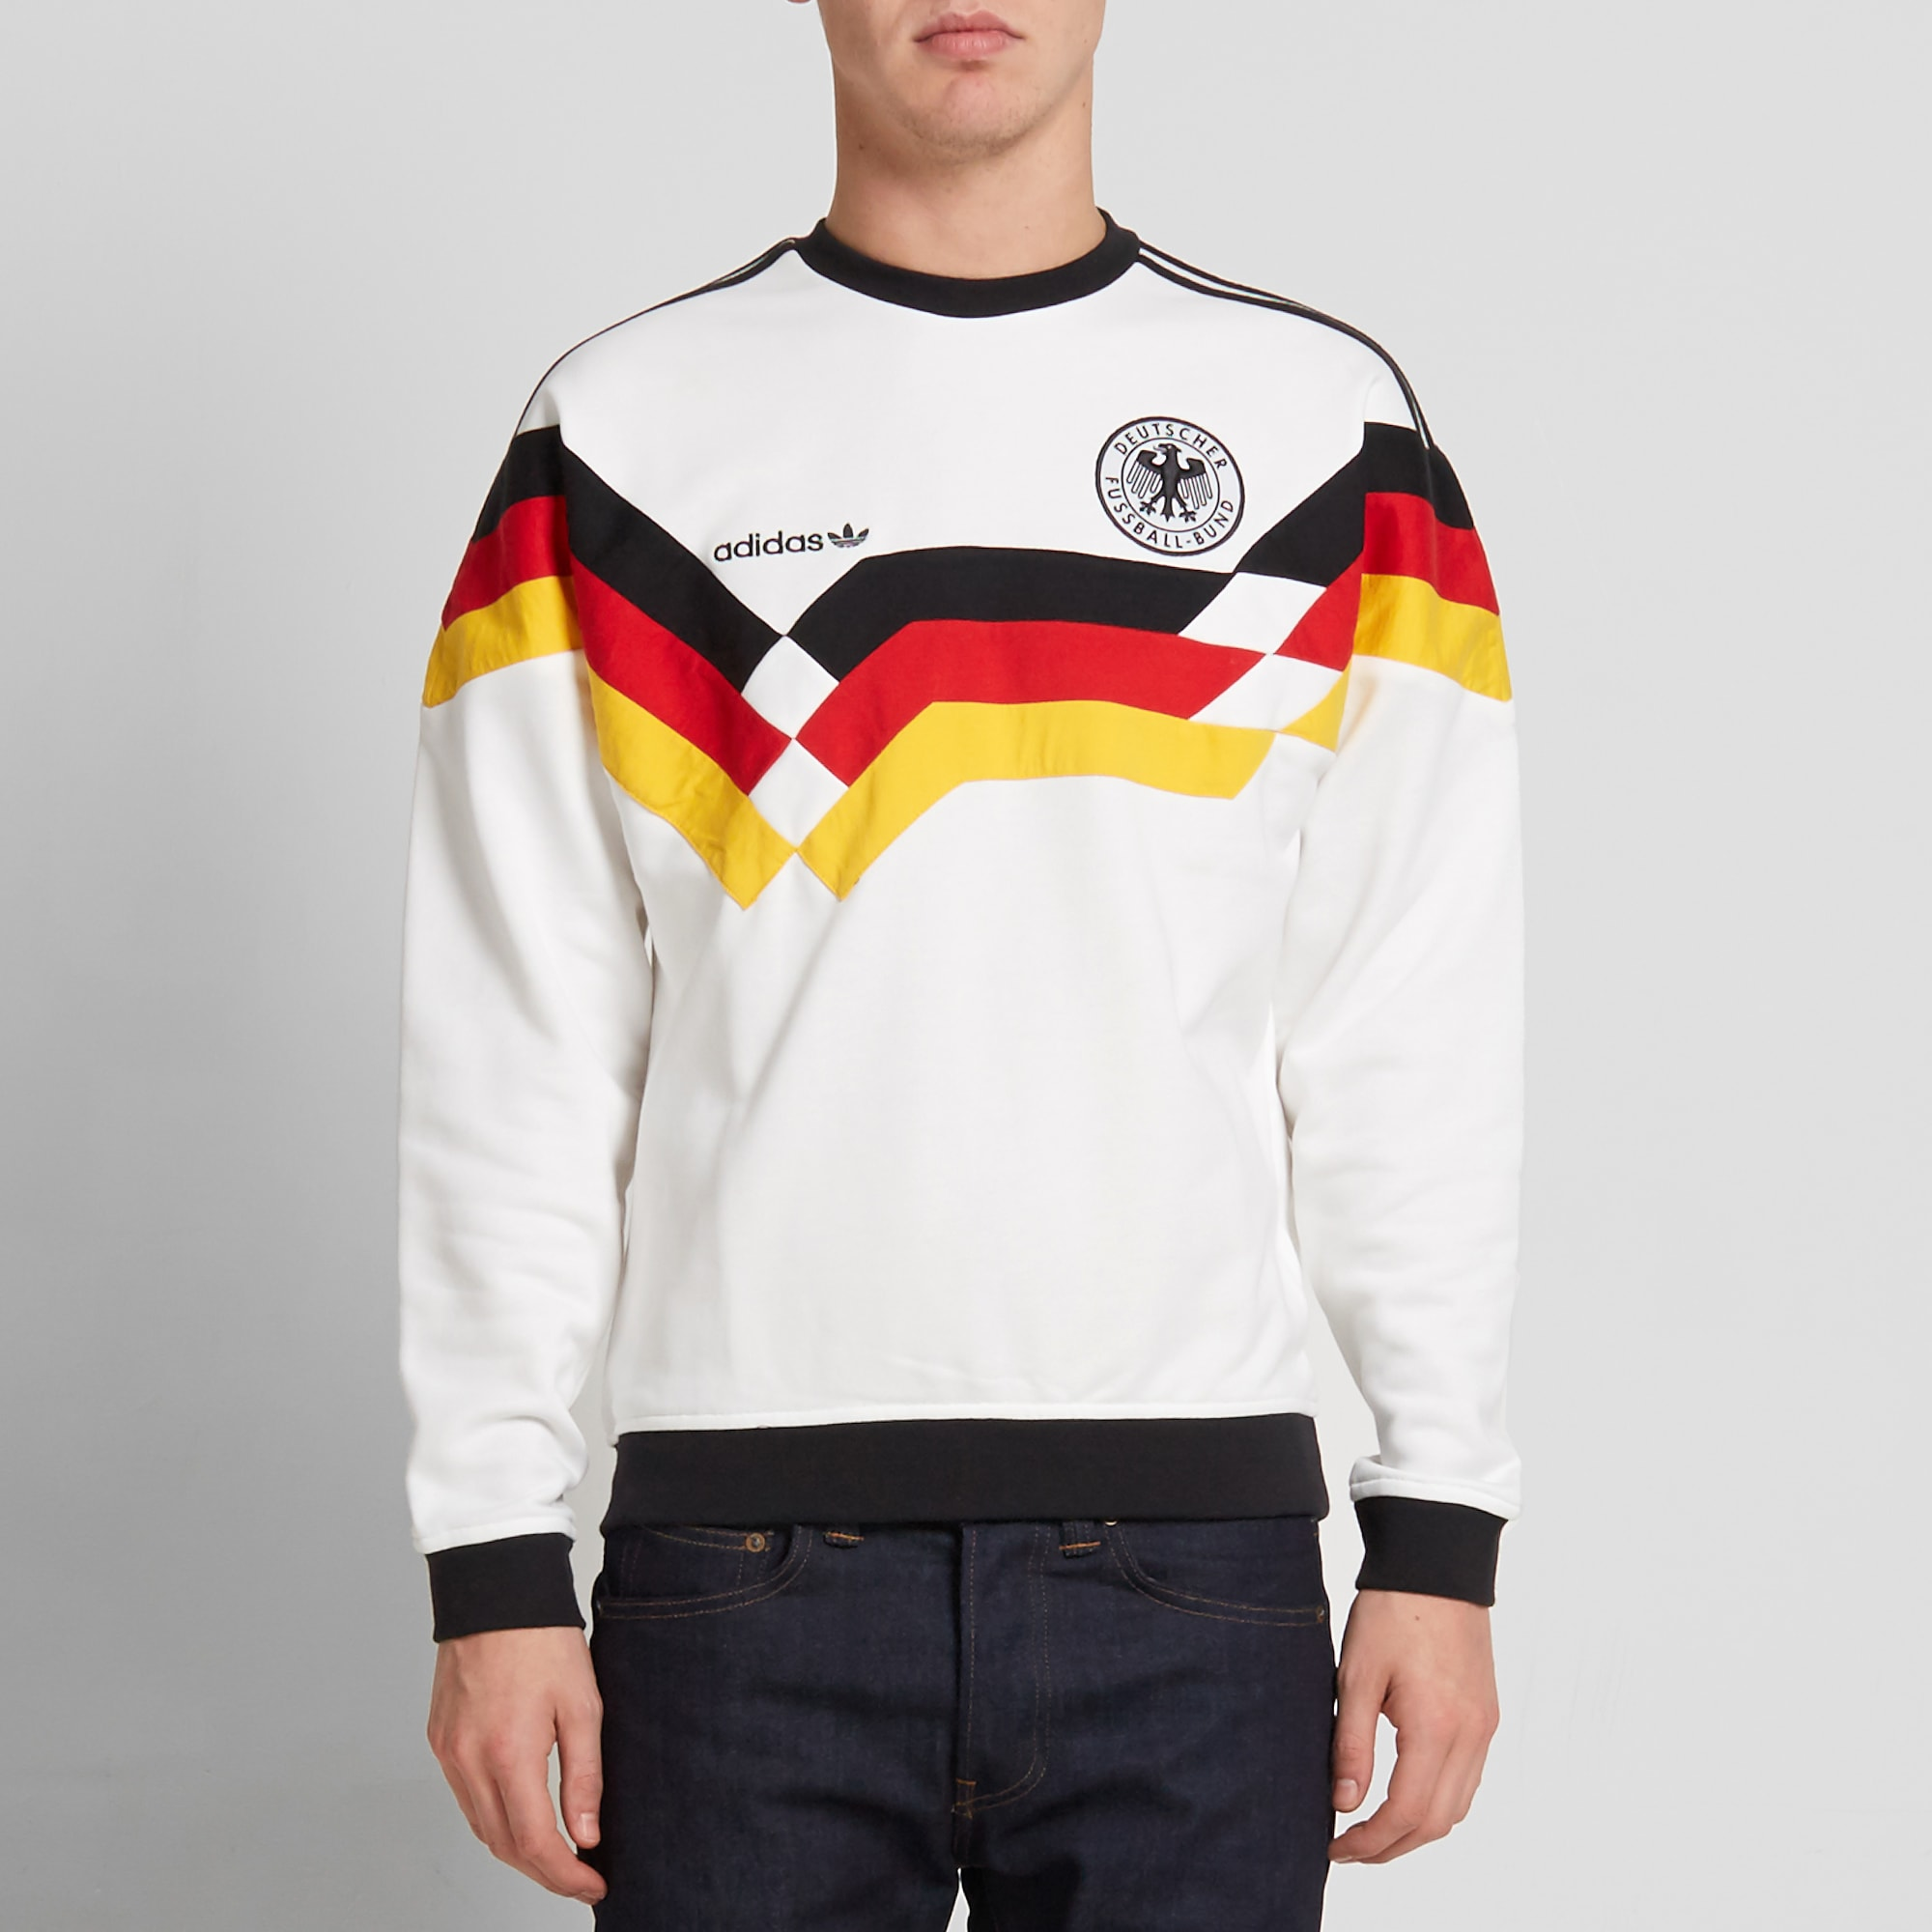 adidas Beckenbauer Sweatshirt Black | adidas US | Outfits